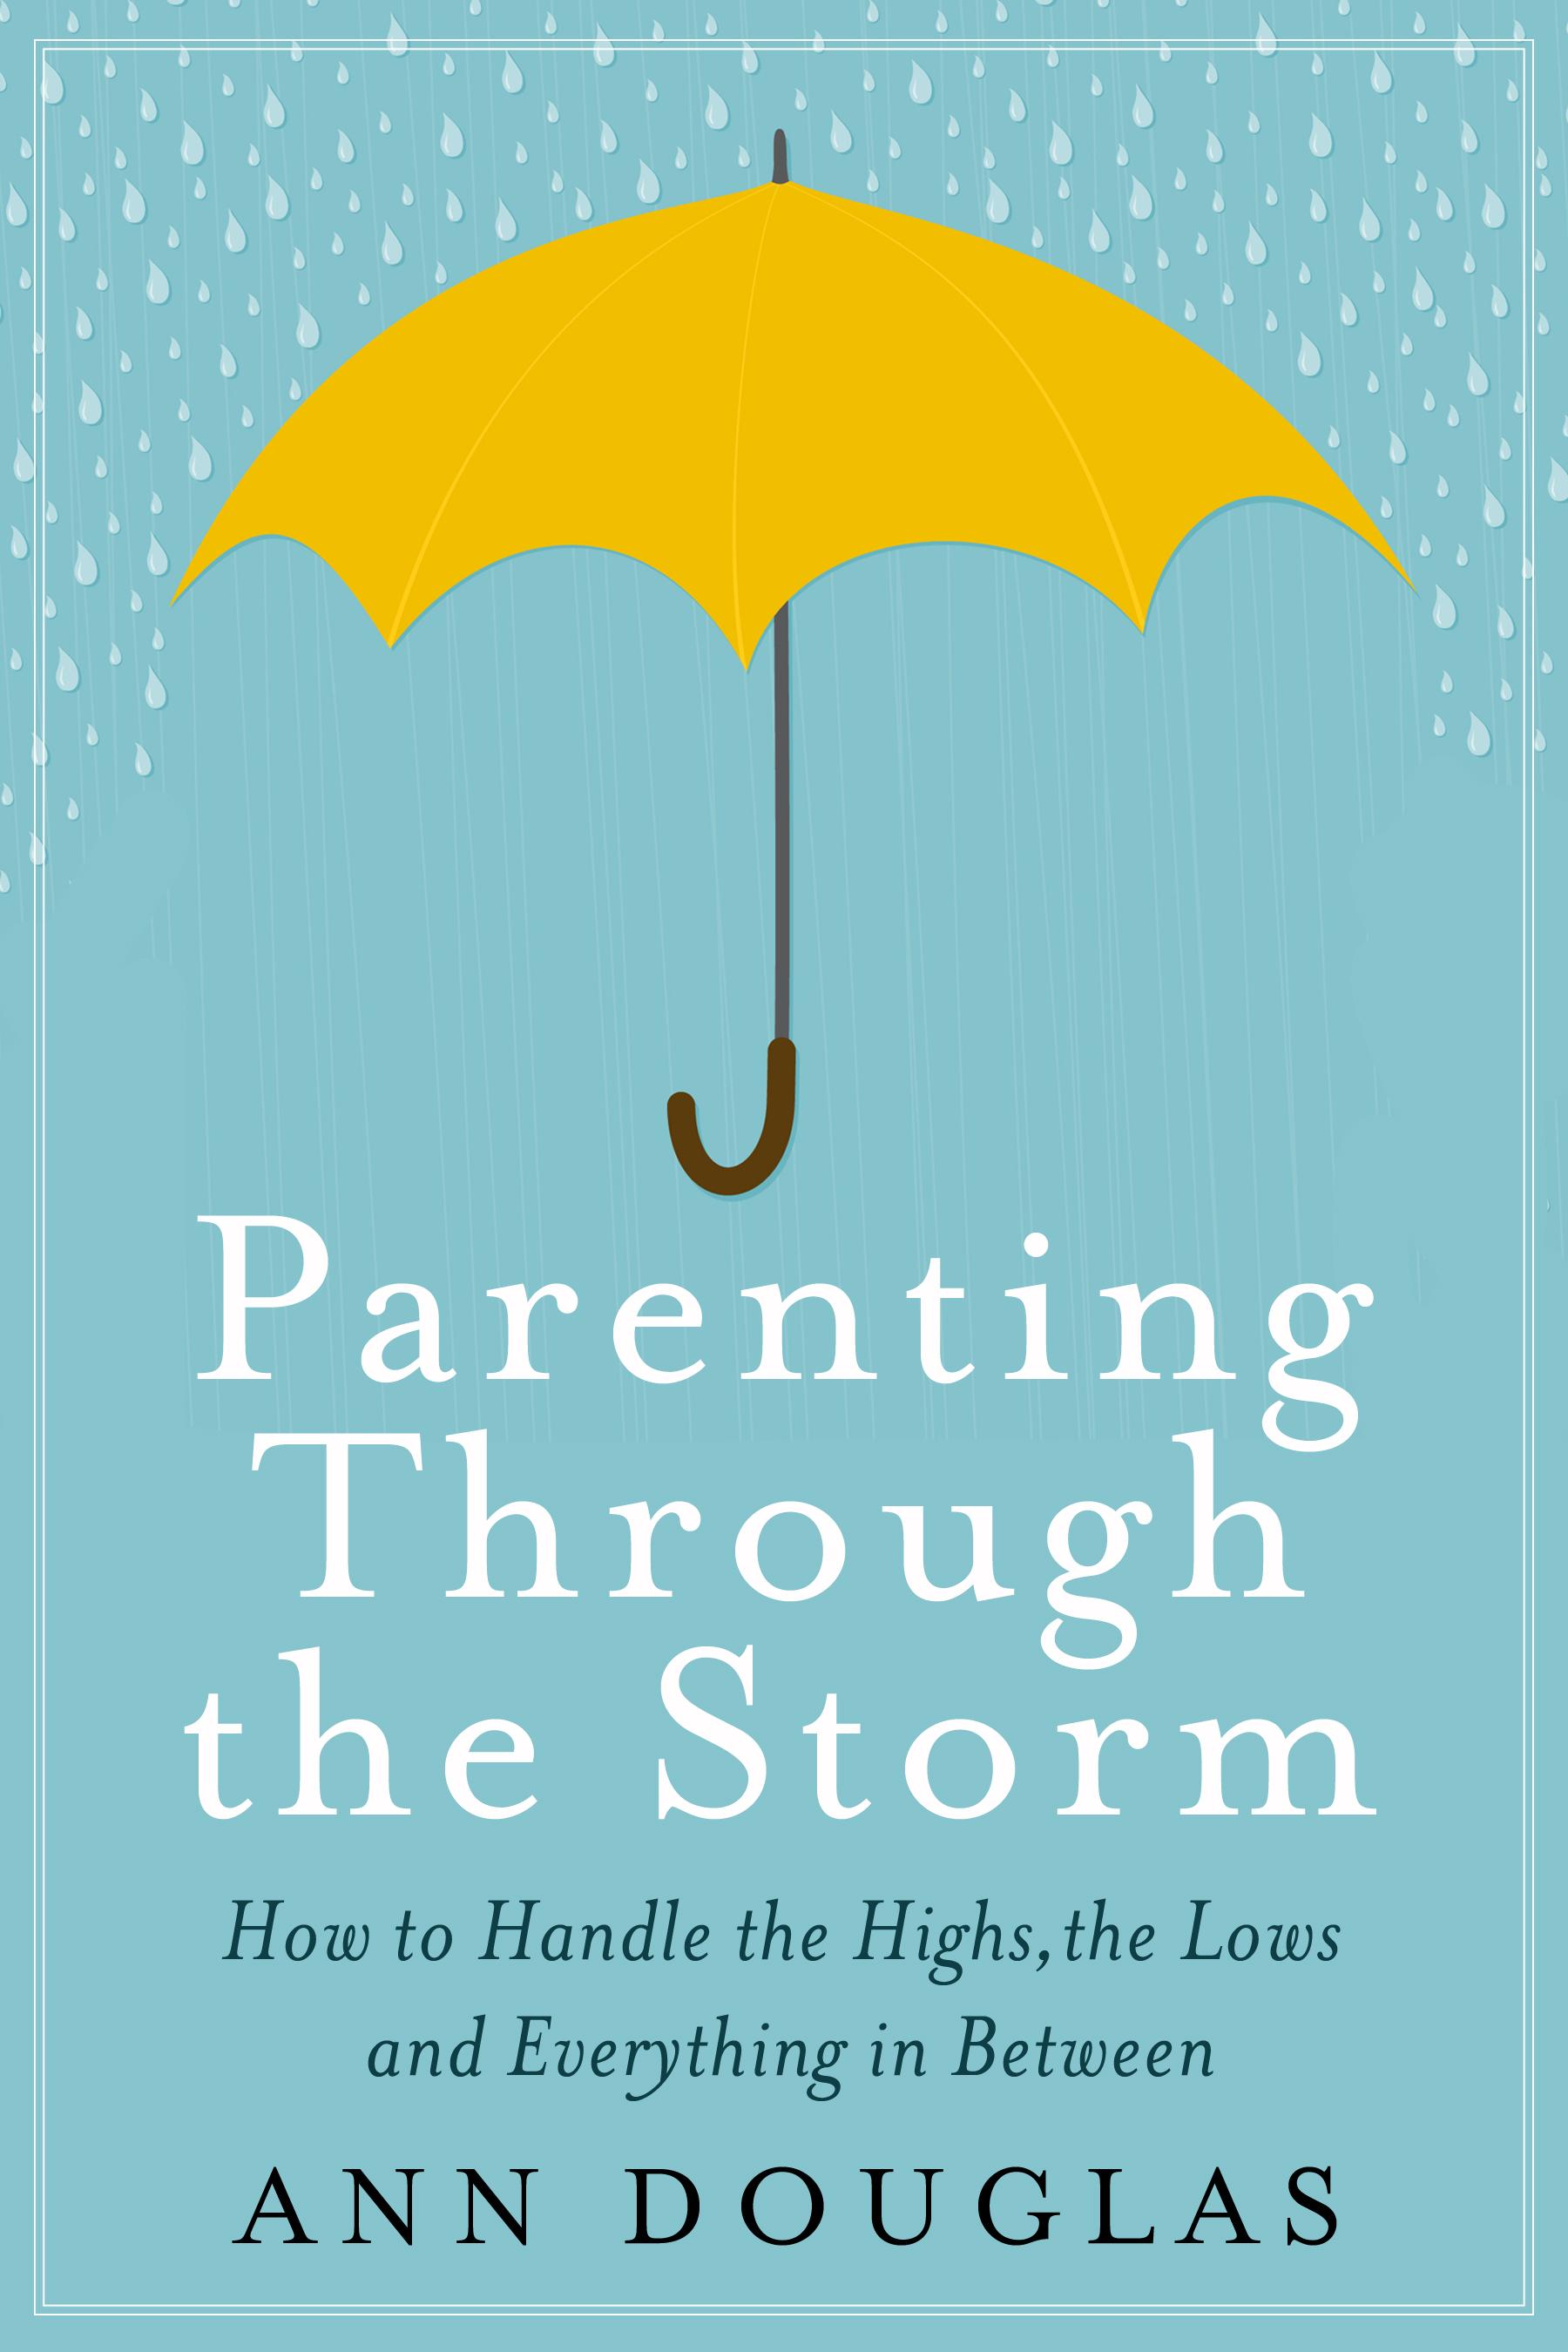 Parenting Through the Storm.jpg